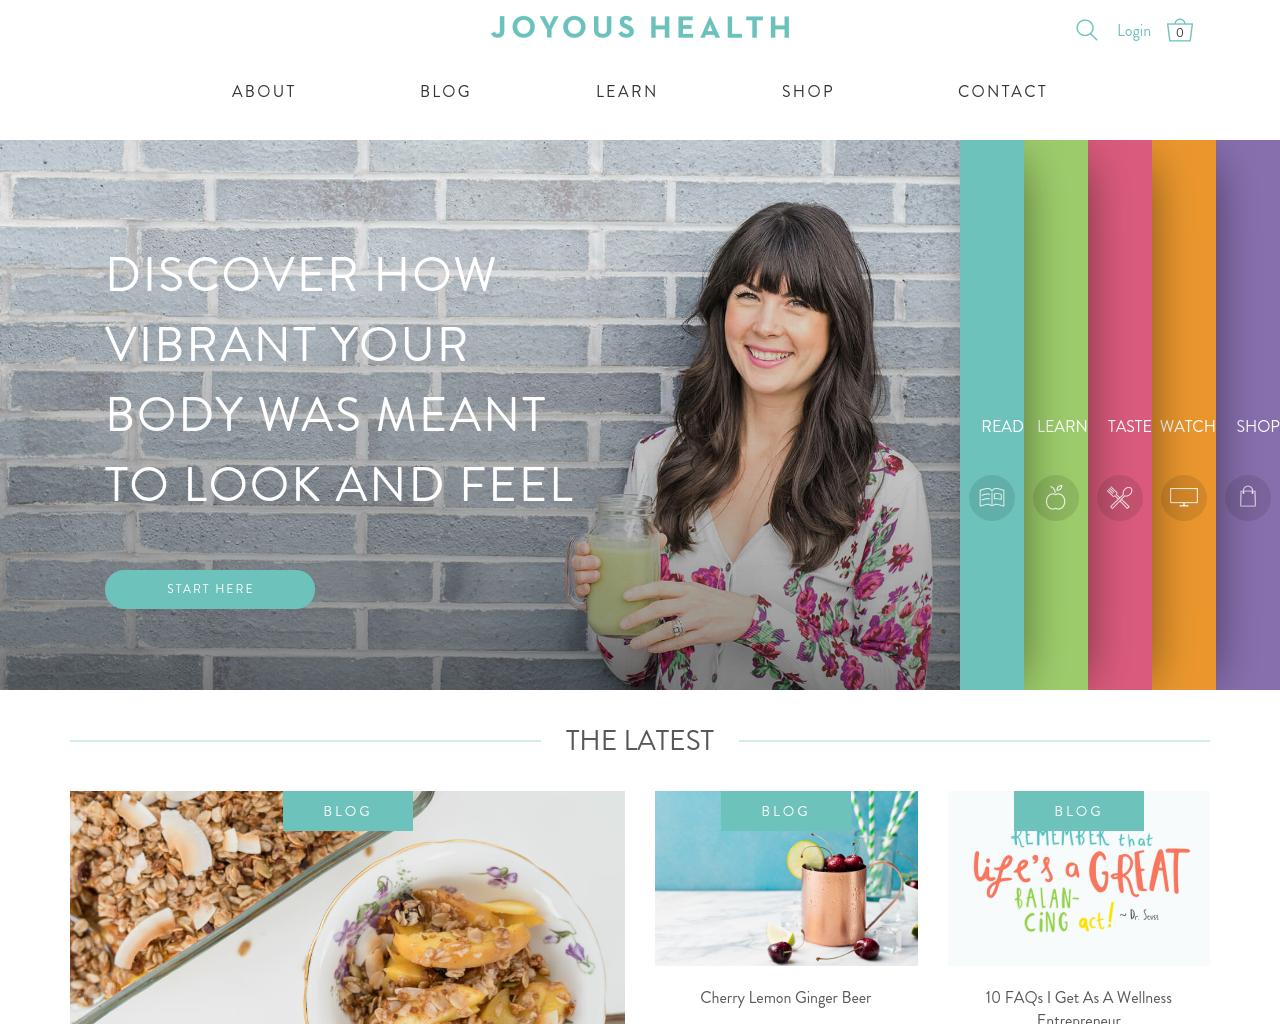 Joyous-Health-Advertising-Reviews-Pricing